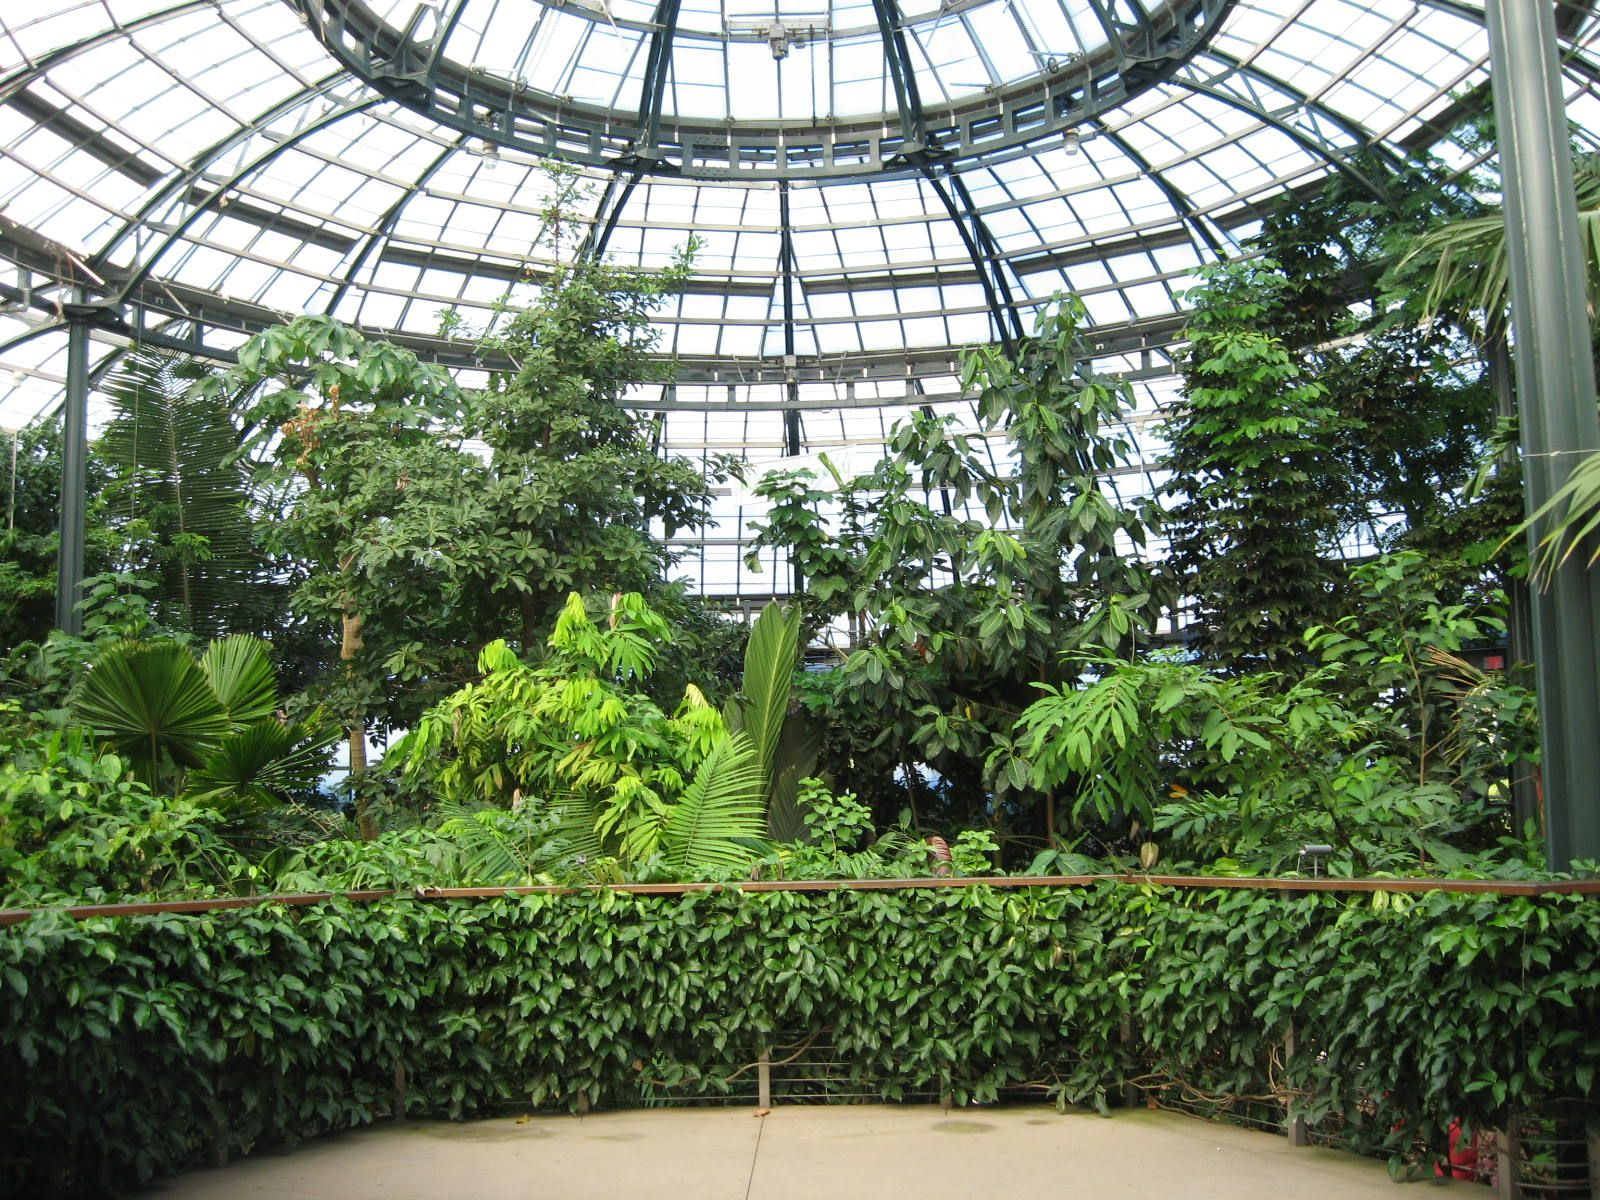 4465ec8c8fed51462b68cc6f79ab9145 - Botanical Gardens Los Angeles Huntington Library